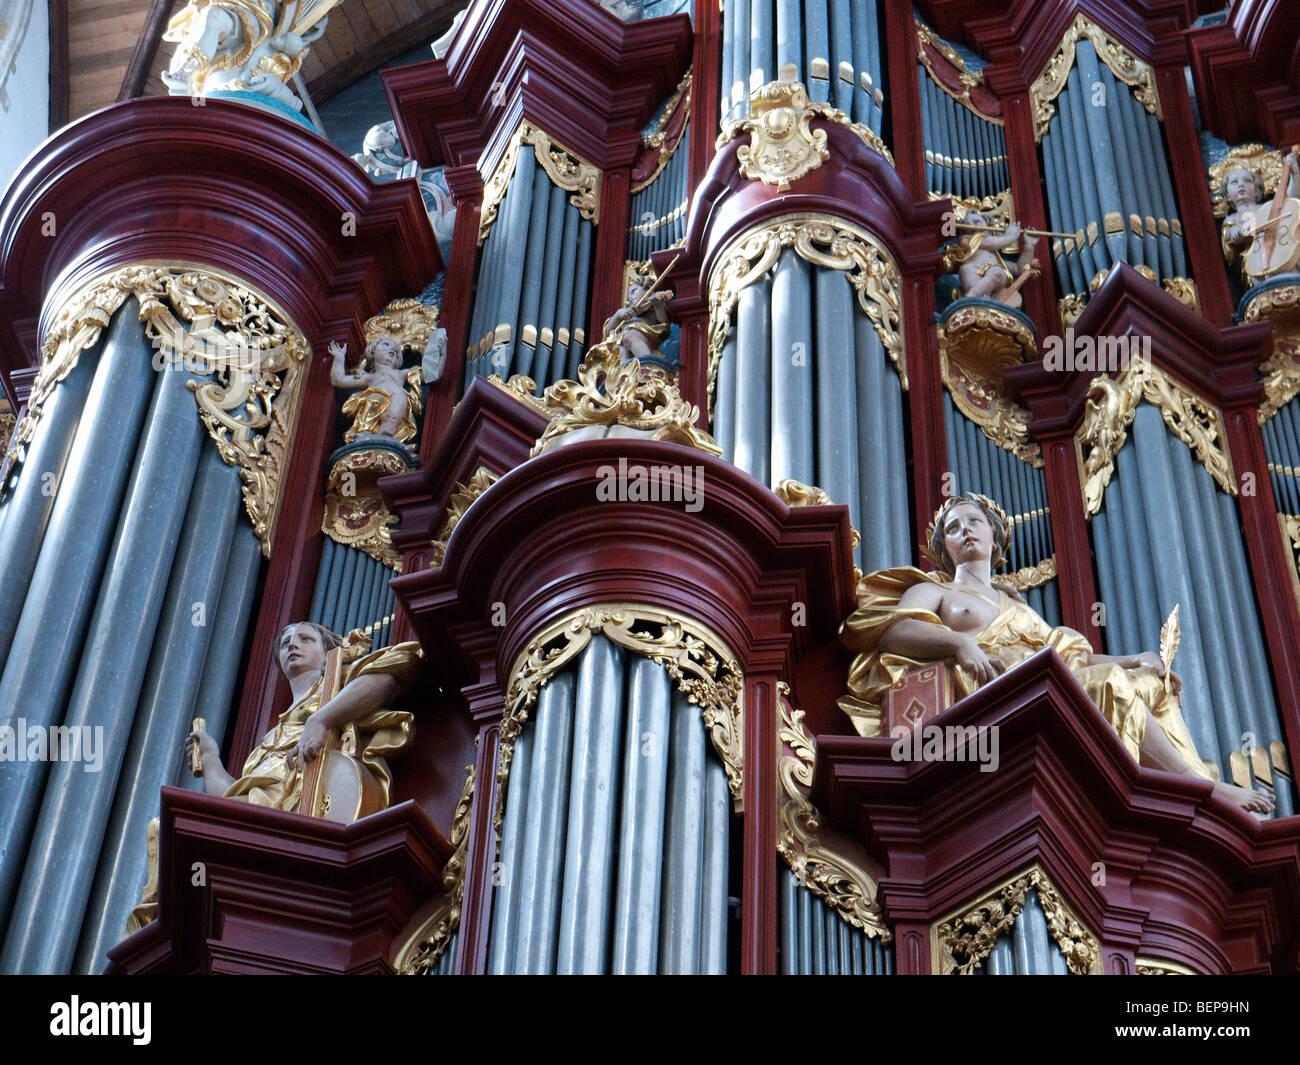 El famoso órgano Sint-Bavokerk (o la iglesia de San Bavo) de Haarlem, Holanda Imagen De Stock